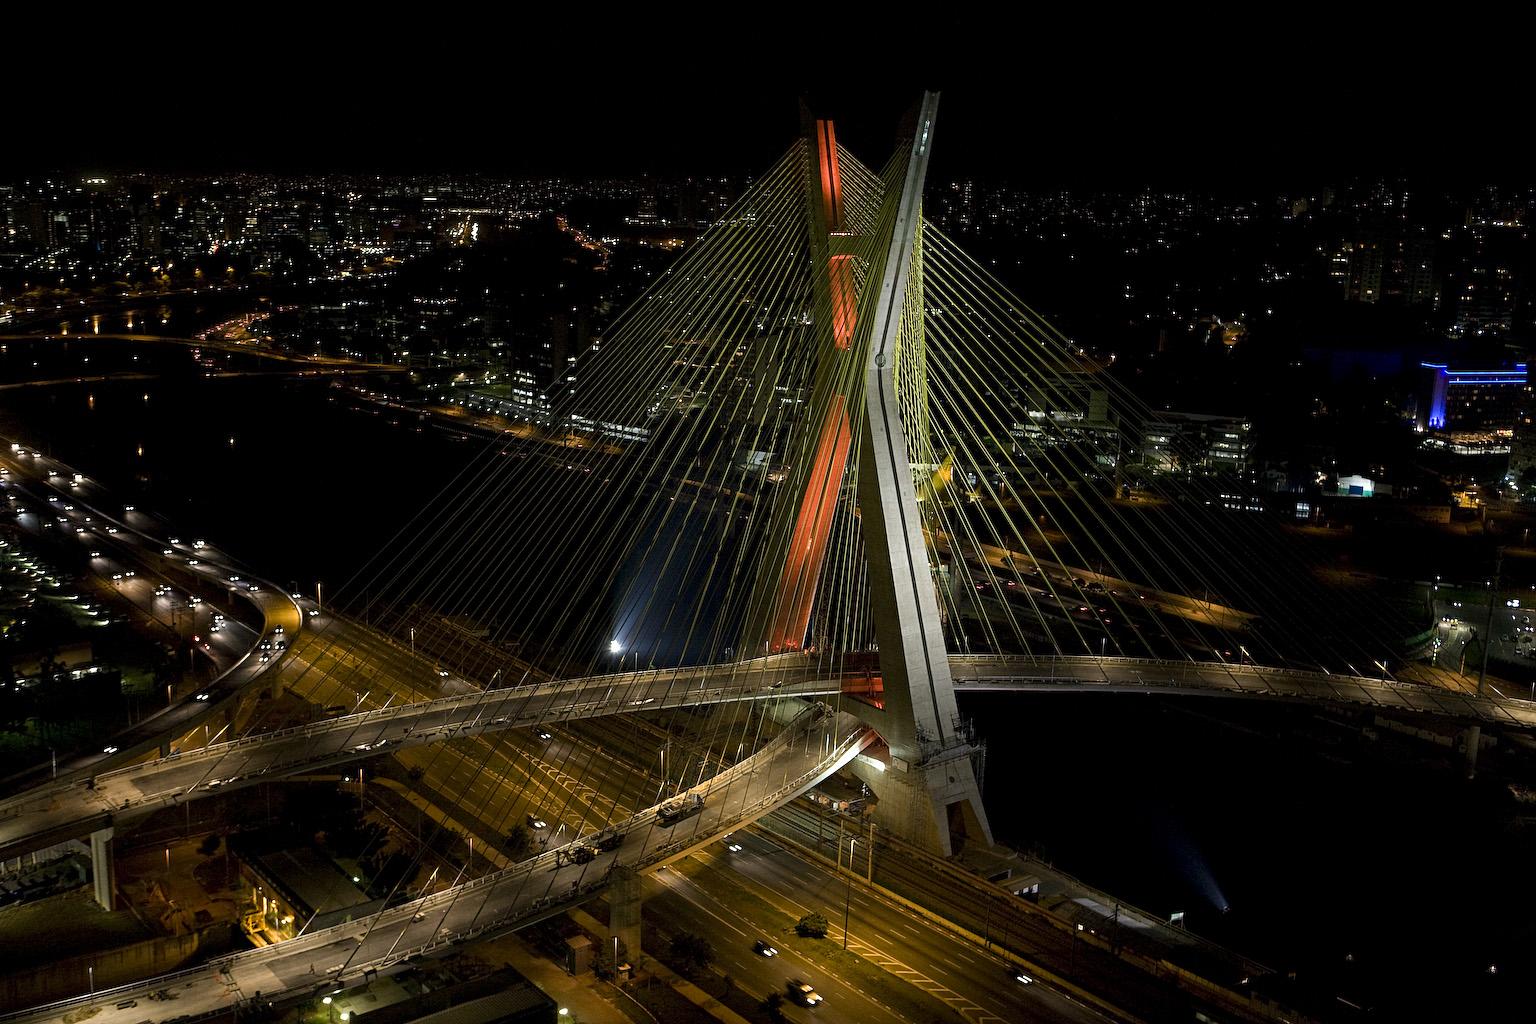 octavio frias de oliveira bridge wallpapers - Octavio Frias de Oliveira Bridge Wallpapers HD Wallpapers